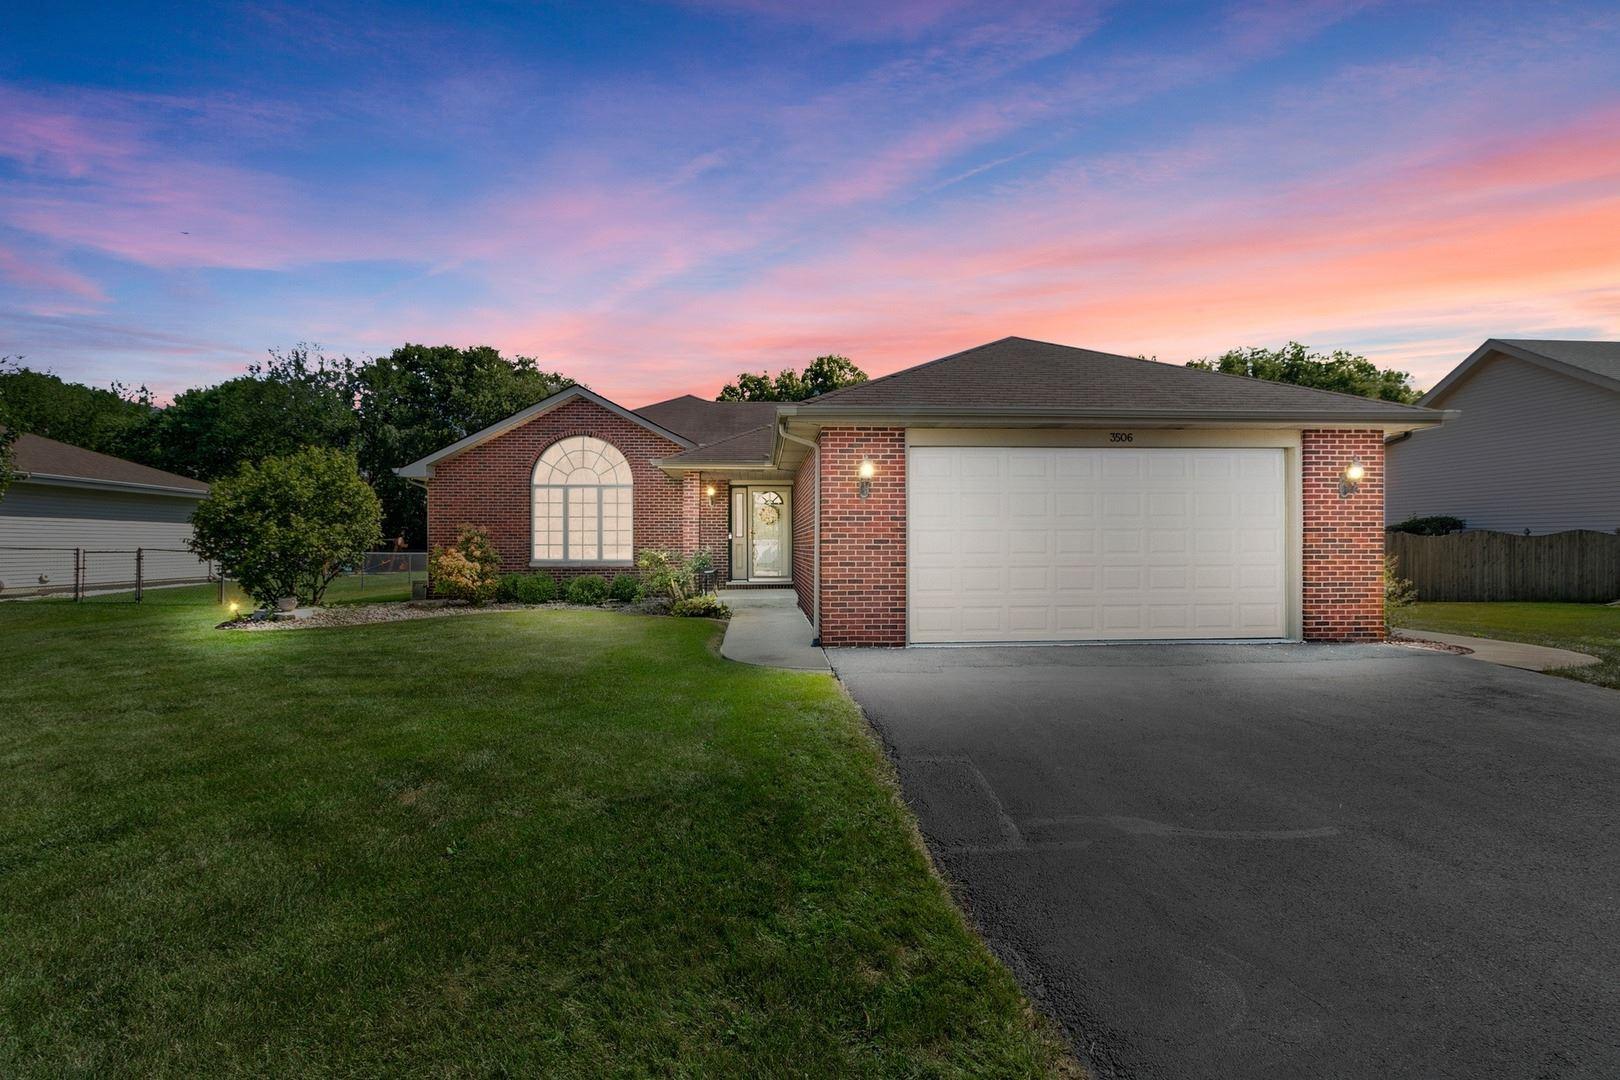 3506 Edgecreek Drive, New Lenox, IL 60451 - #: 11219051